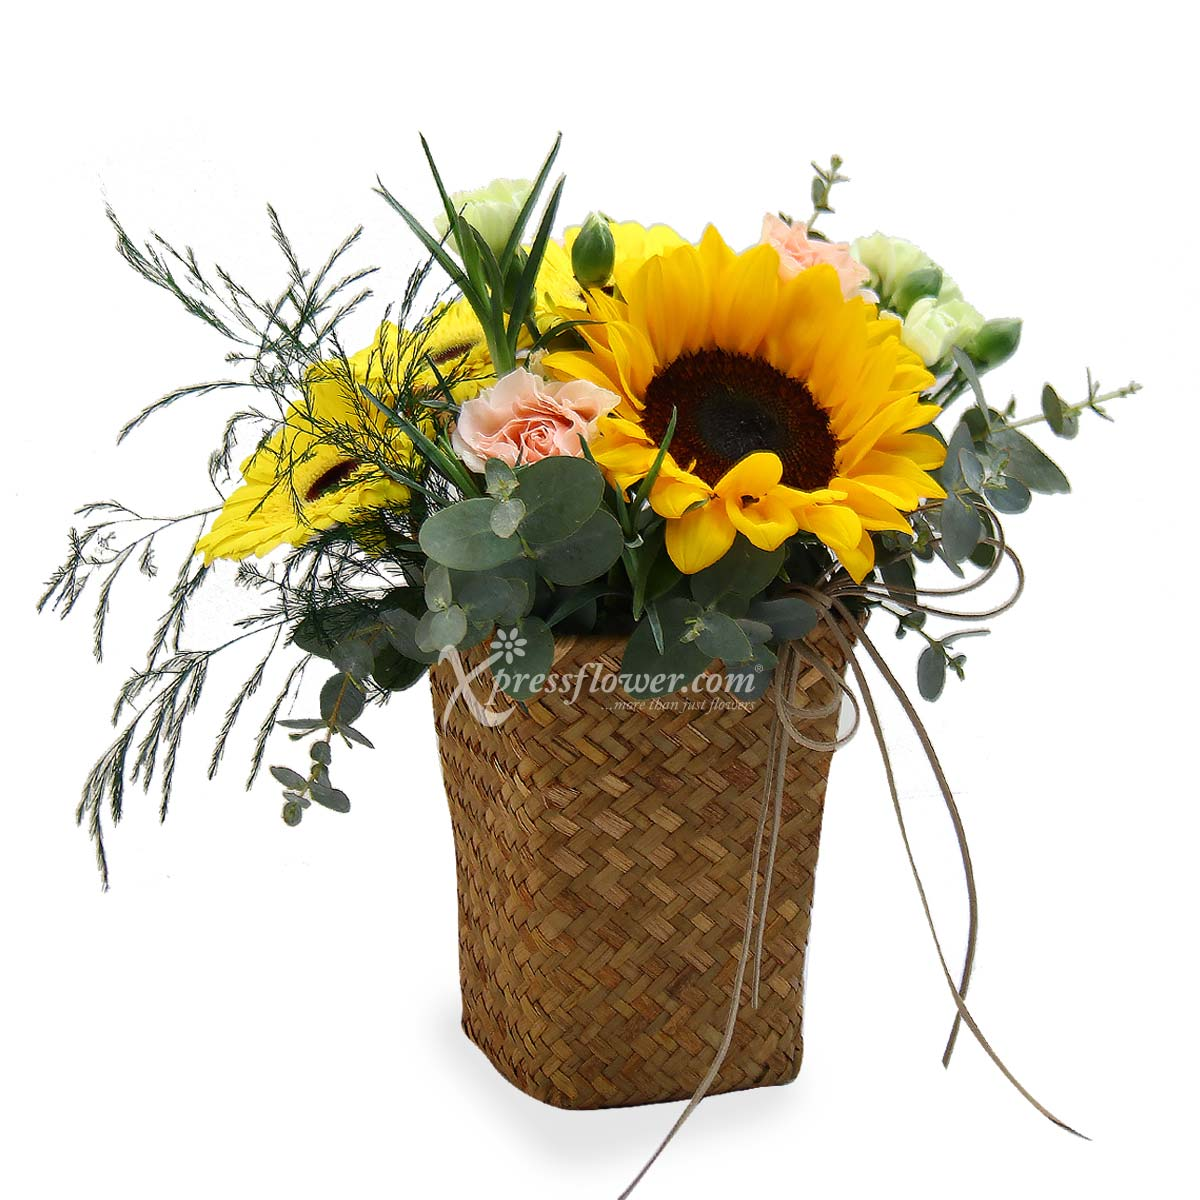 Basket Full of Sunshine (1 sunflower & 3 yellow gerberas)